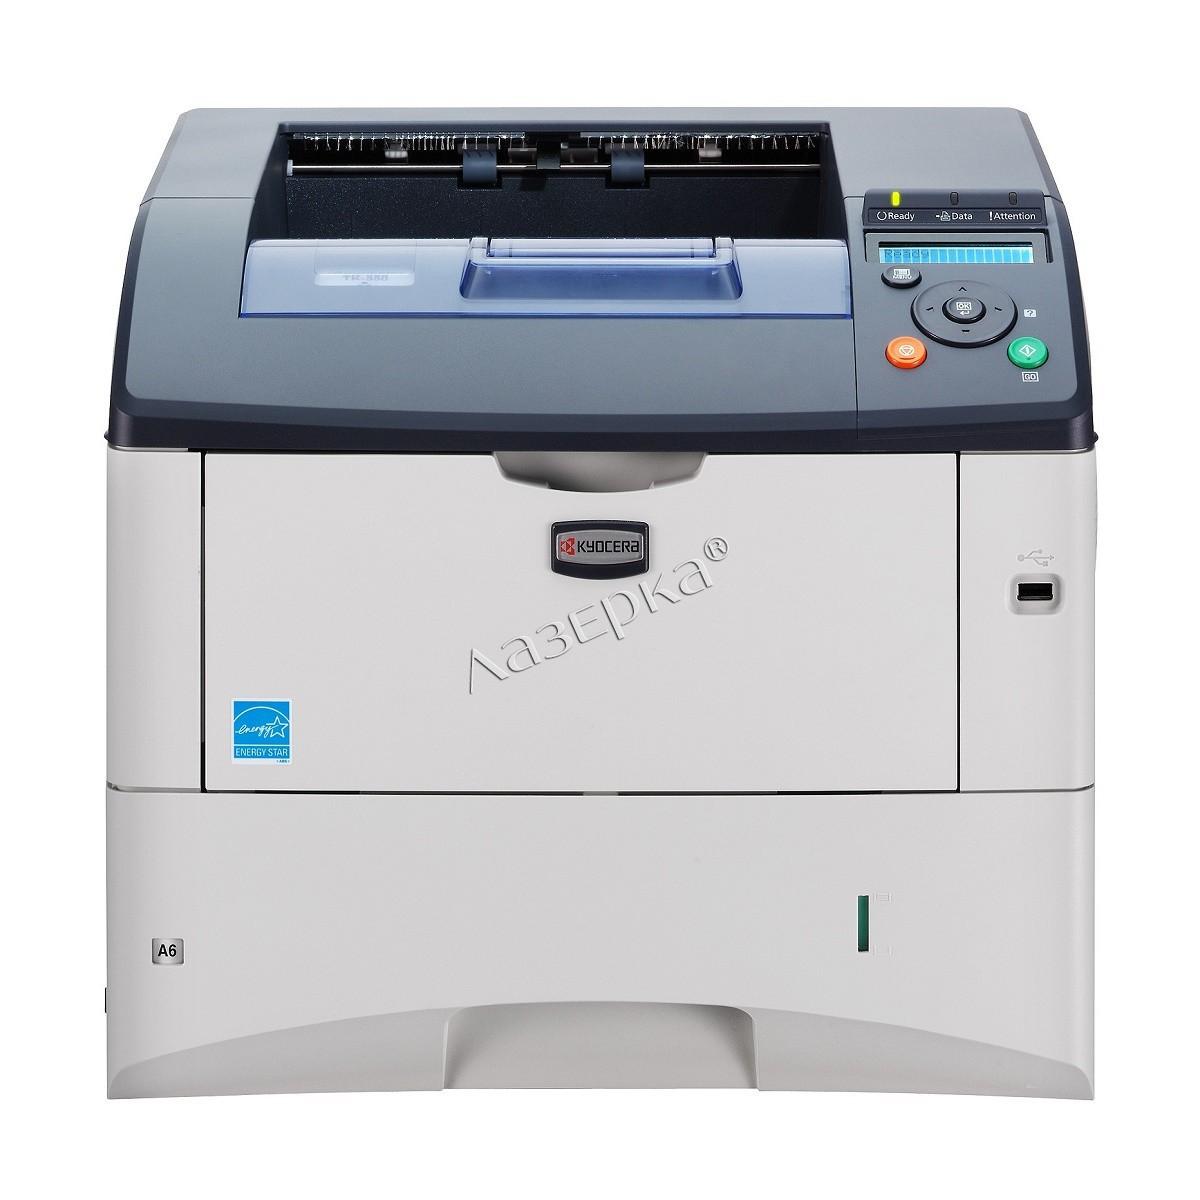 Картридж CACTUS CS-C728/CS-C728S для принтеров CANON i-SENSYS MF4410/ MF4430/ MF4450/ MF4550D/ MF4570DN/ MF 4580DN 2100 стр.